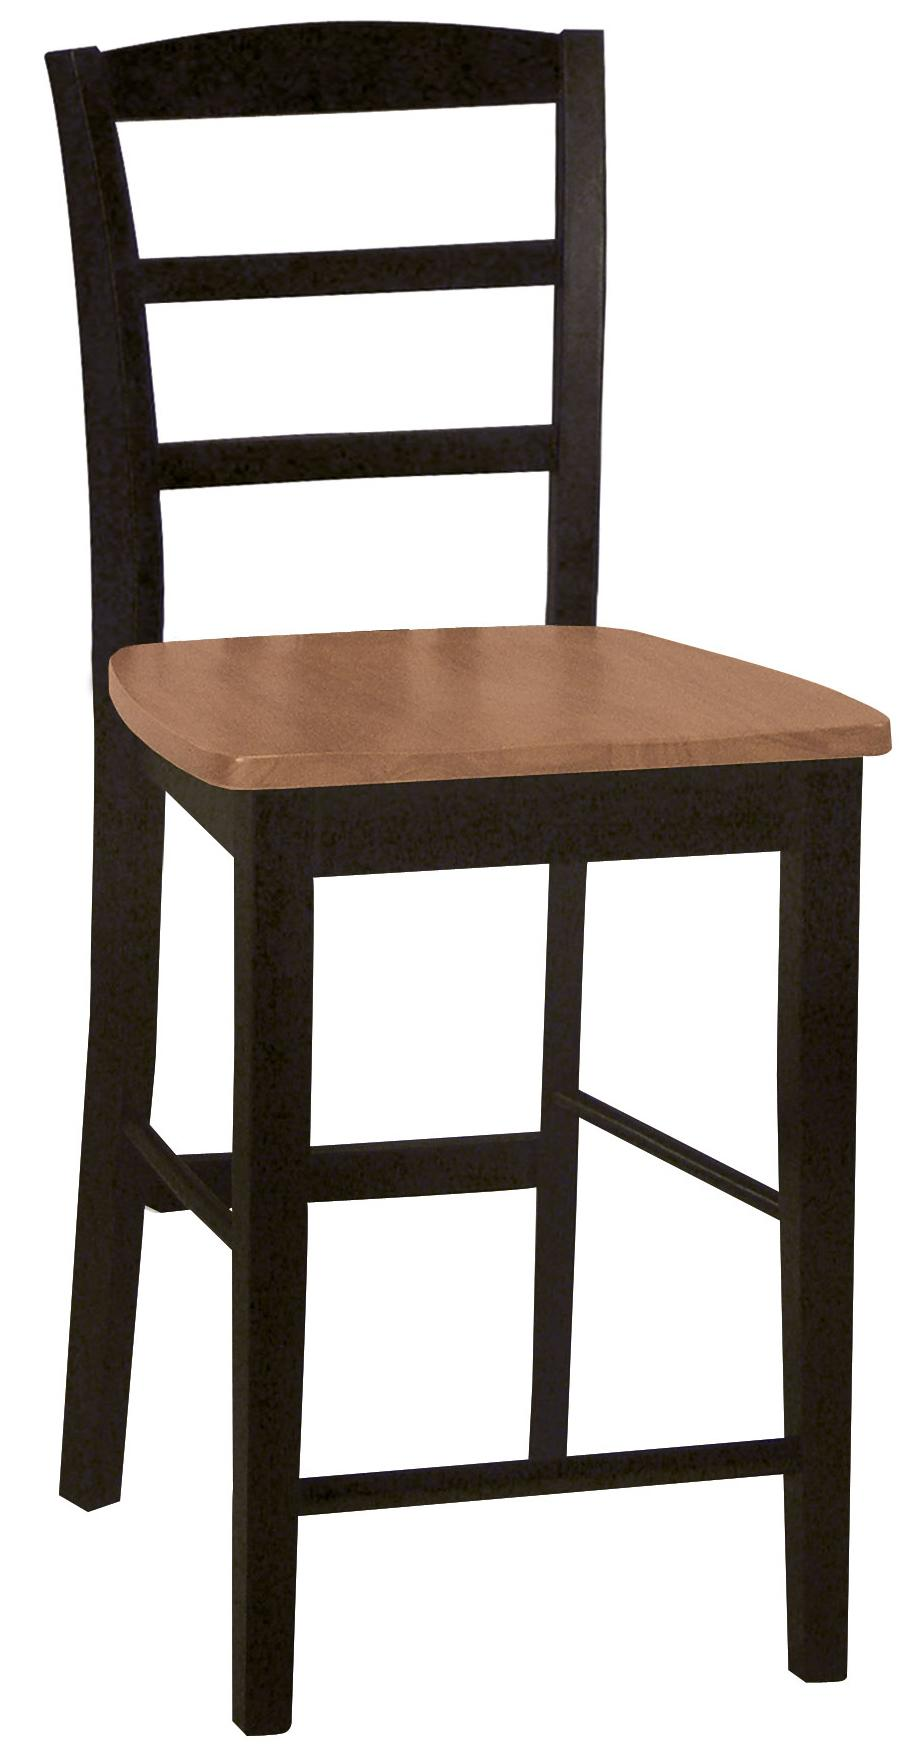 Dining Essentials Ladderback Bar Chair by John Thomas at Furniture Barn